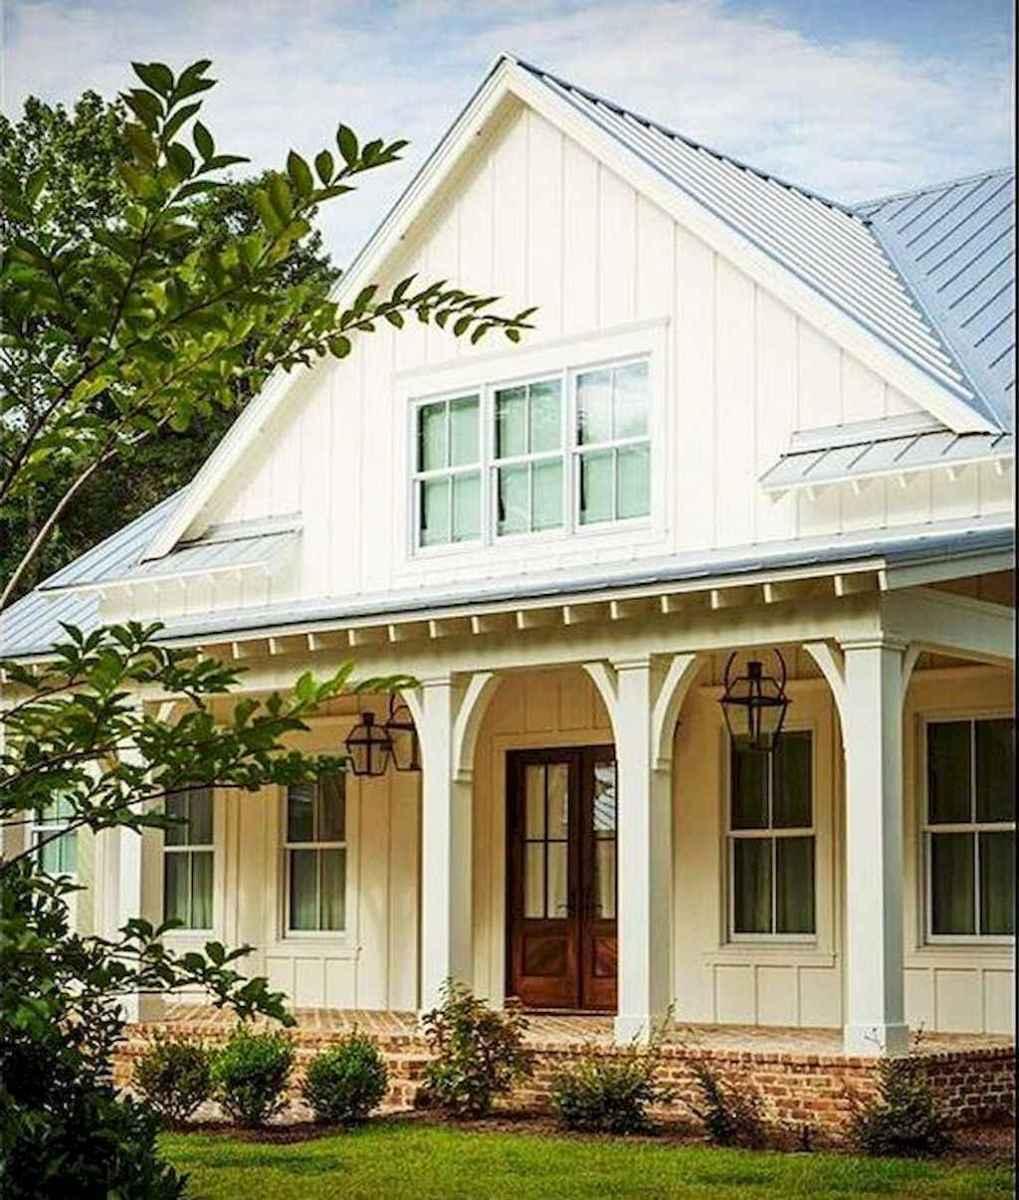 130 Stunning Farmhouse Exterior Design Ideas (92)